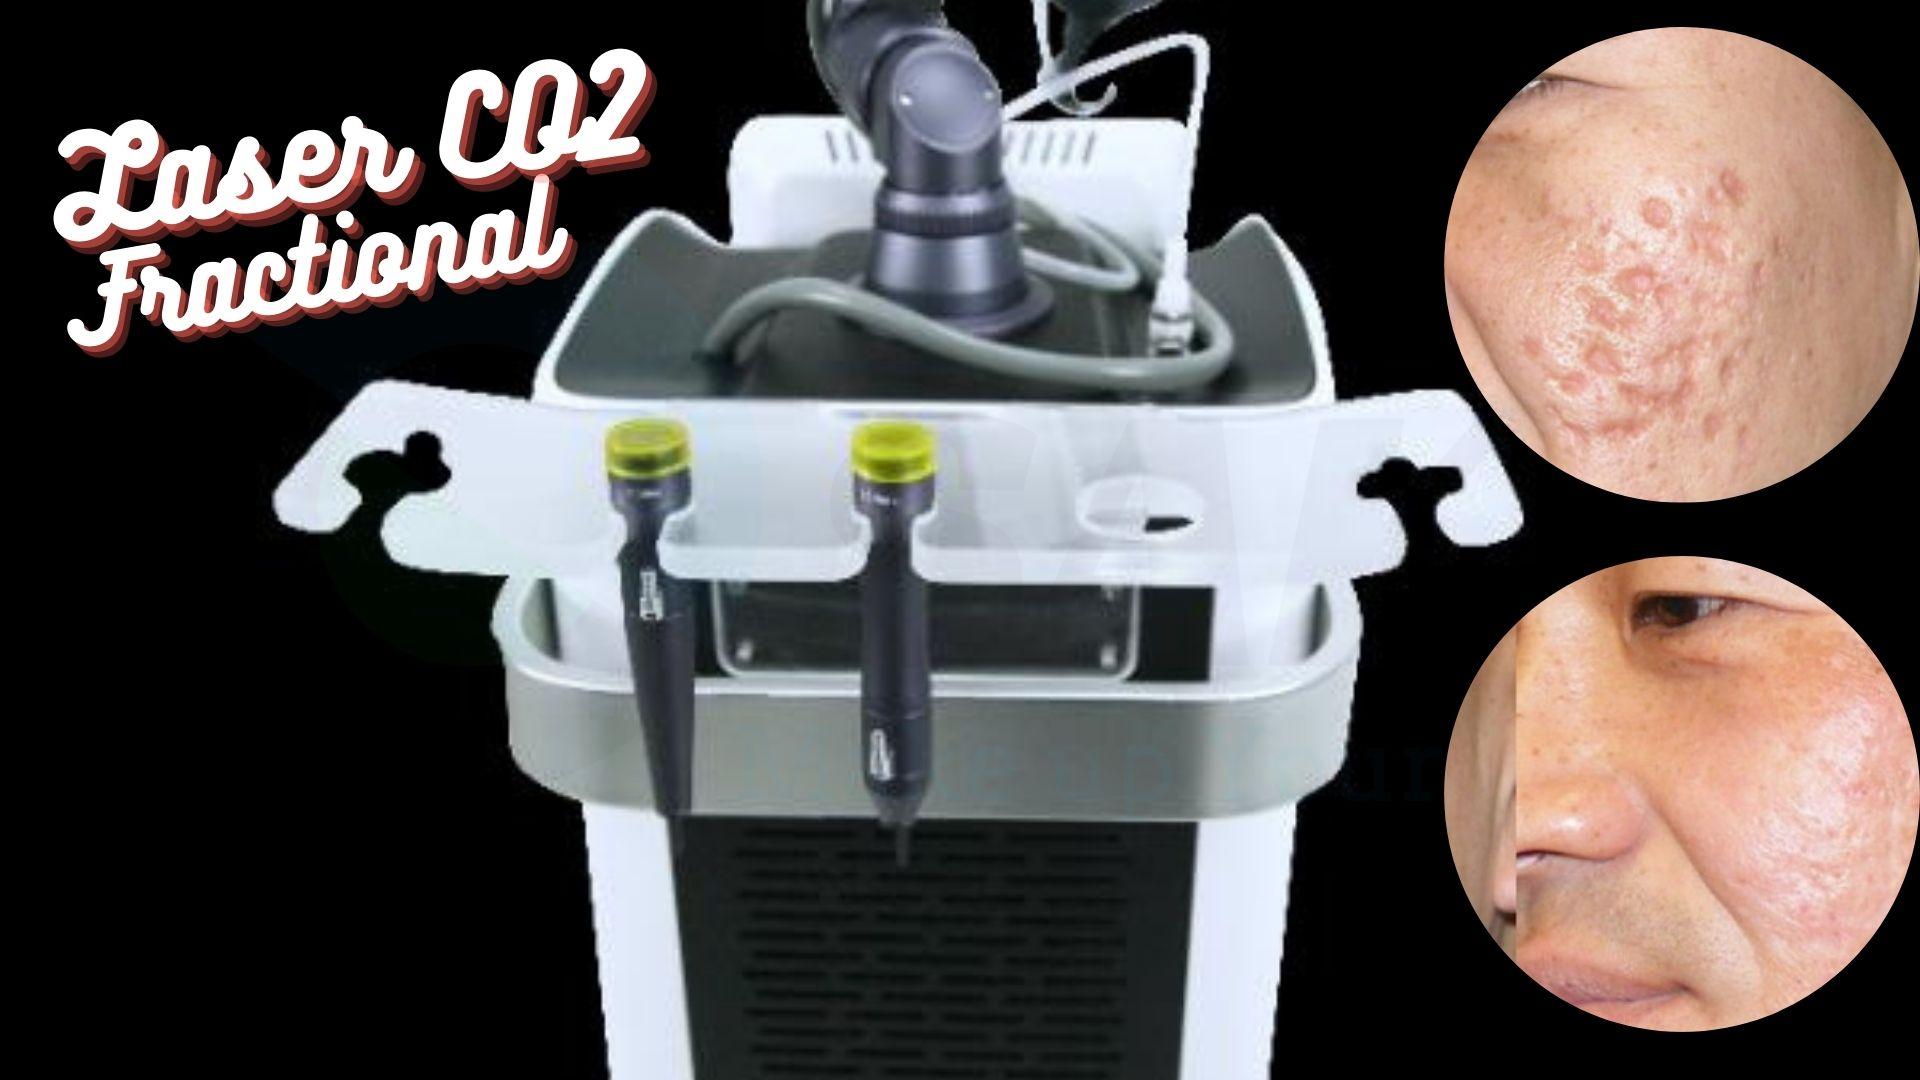 Công nghệ trị sẹo Laser CO2 Fractional